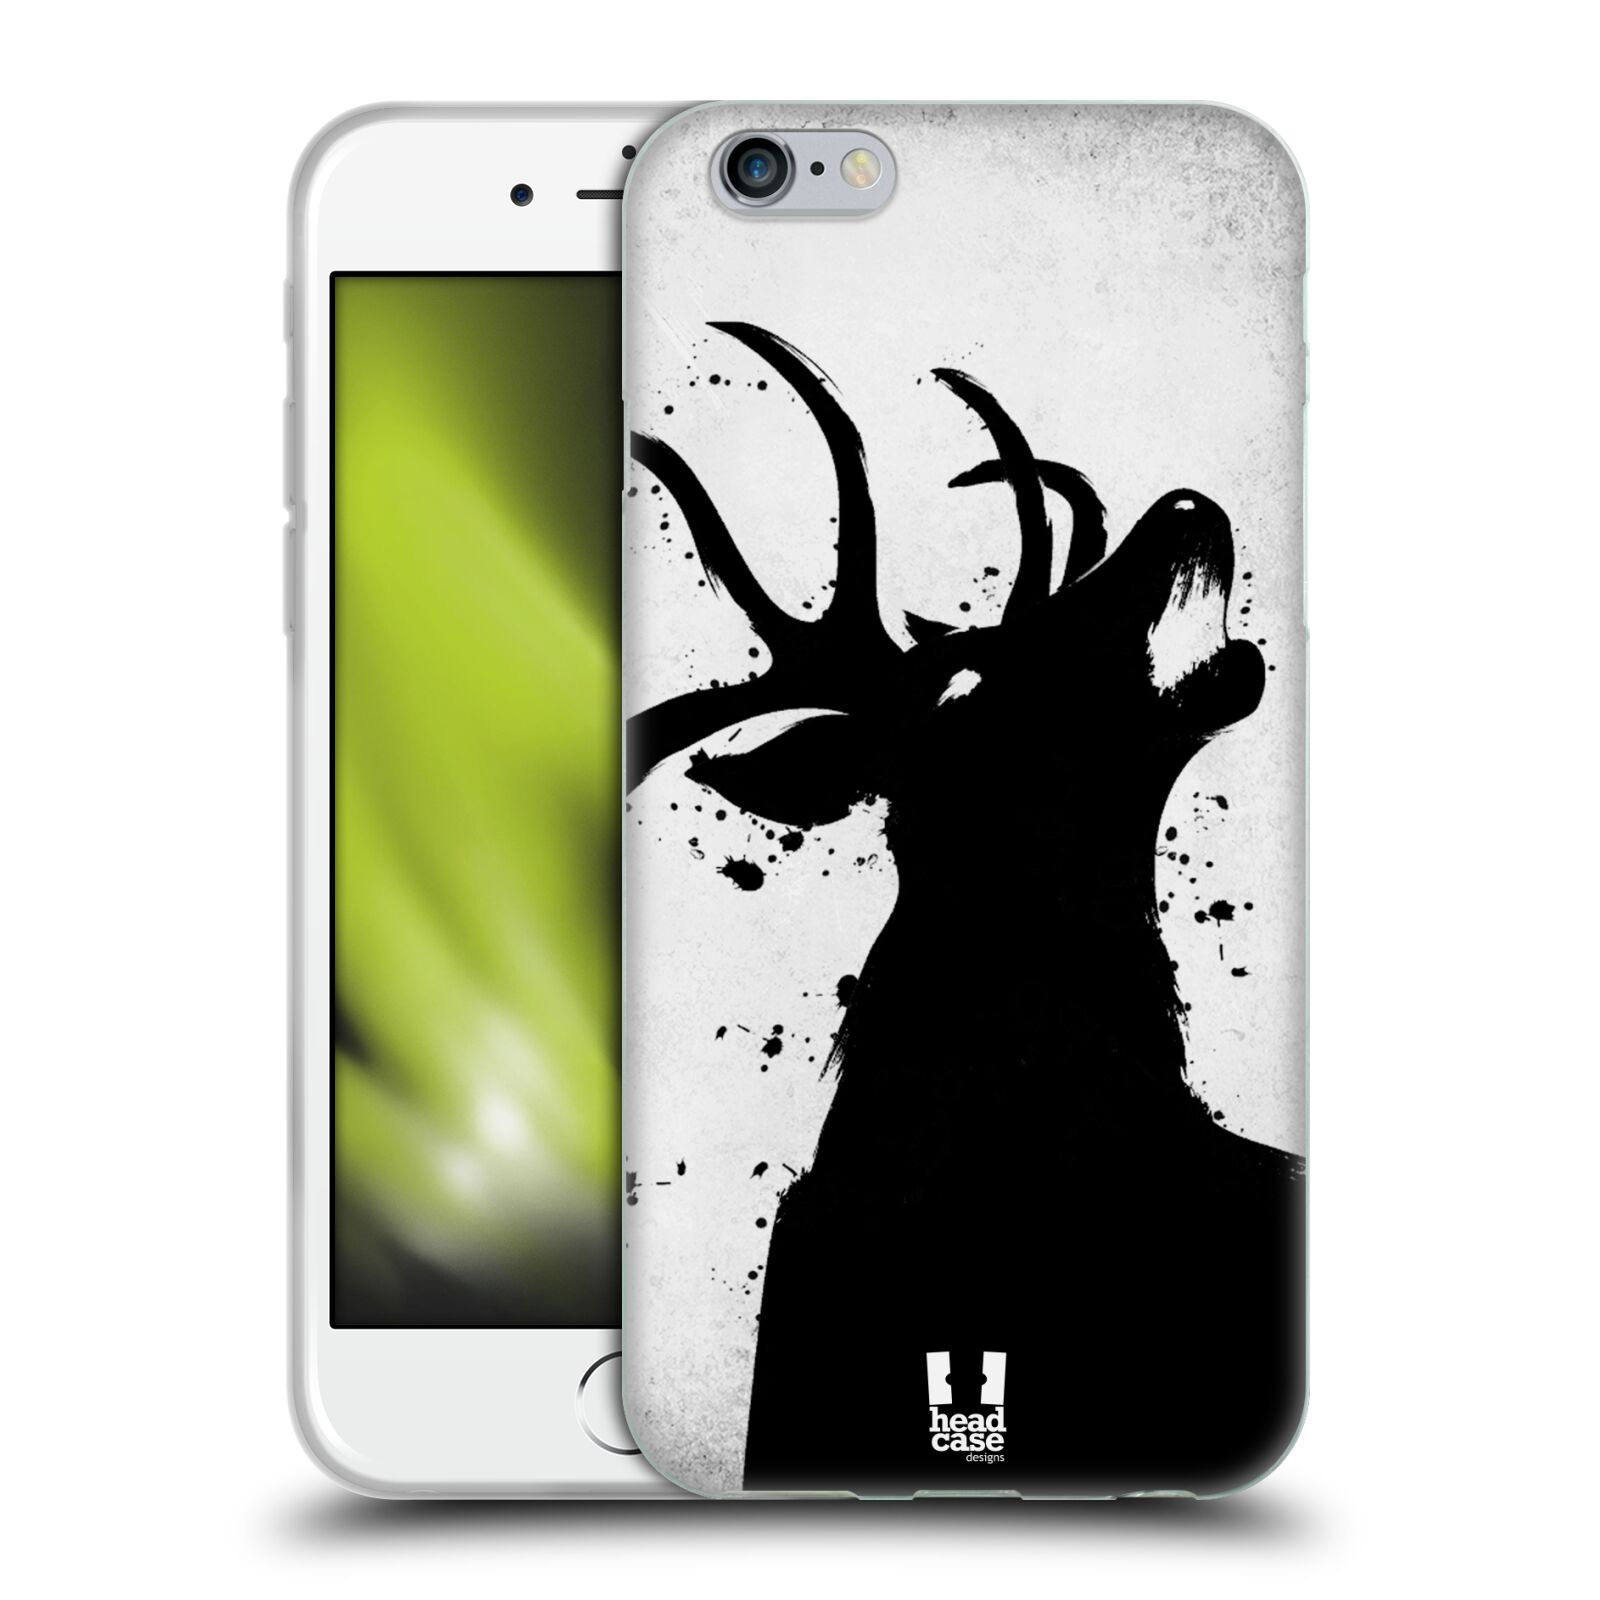 HEAD CASE silikonový obal na mobil Apple Iphone 6/6S vzor Kresba tuš zvíře jelen